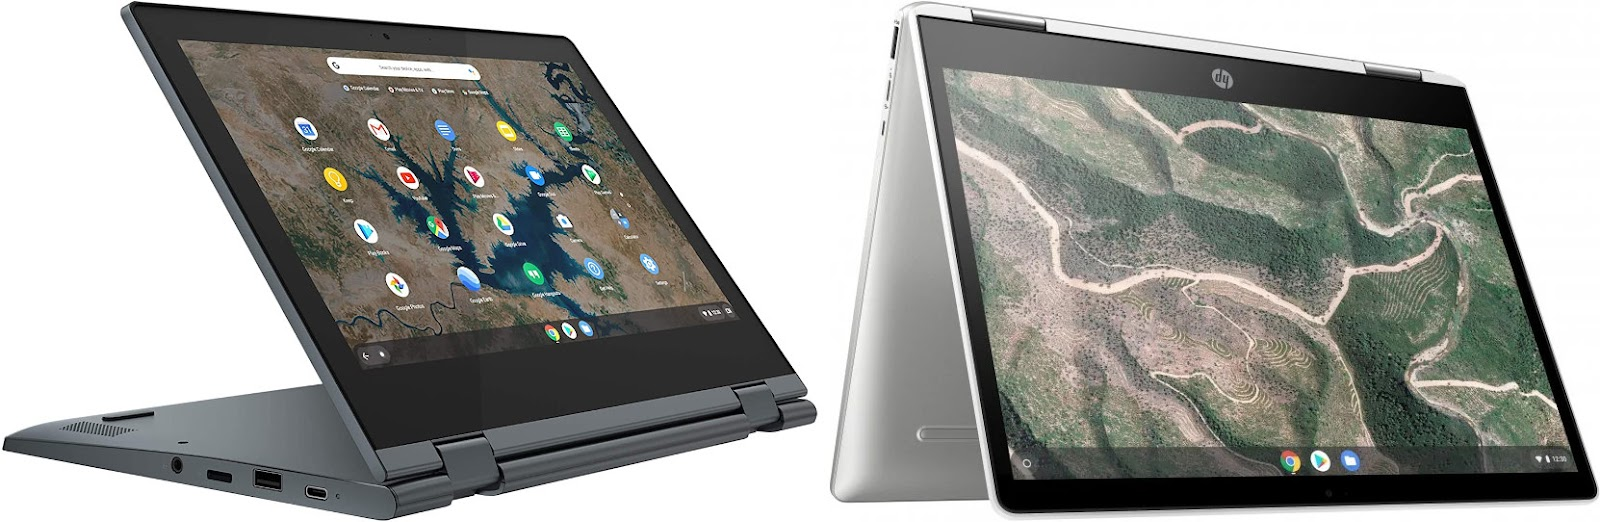 Lenovo IdeaPad Flex 3 Chromebook 11IGL05 (82BB000NSP) vs HP Chromebook x360 12b-ca0001ns